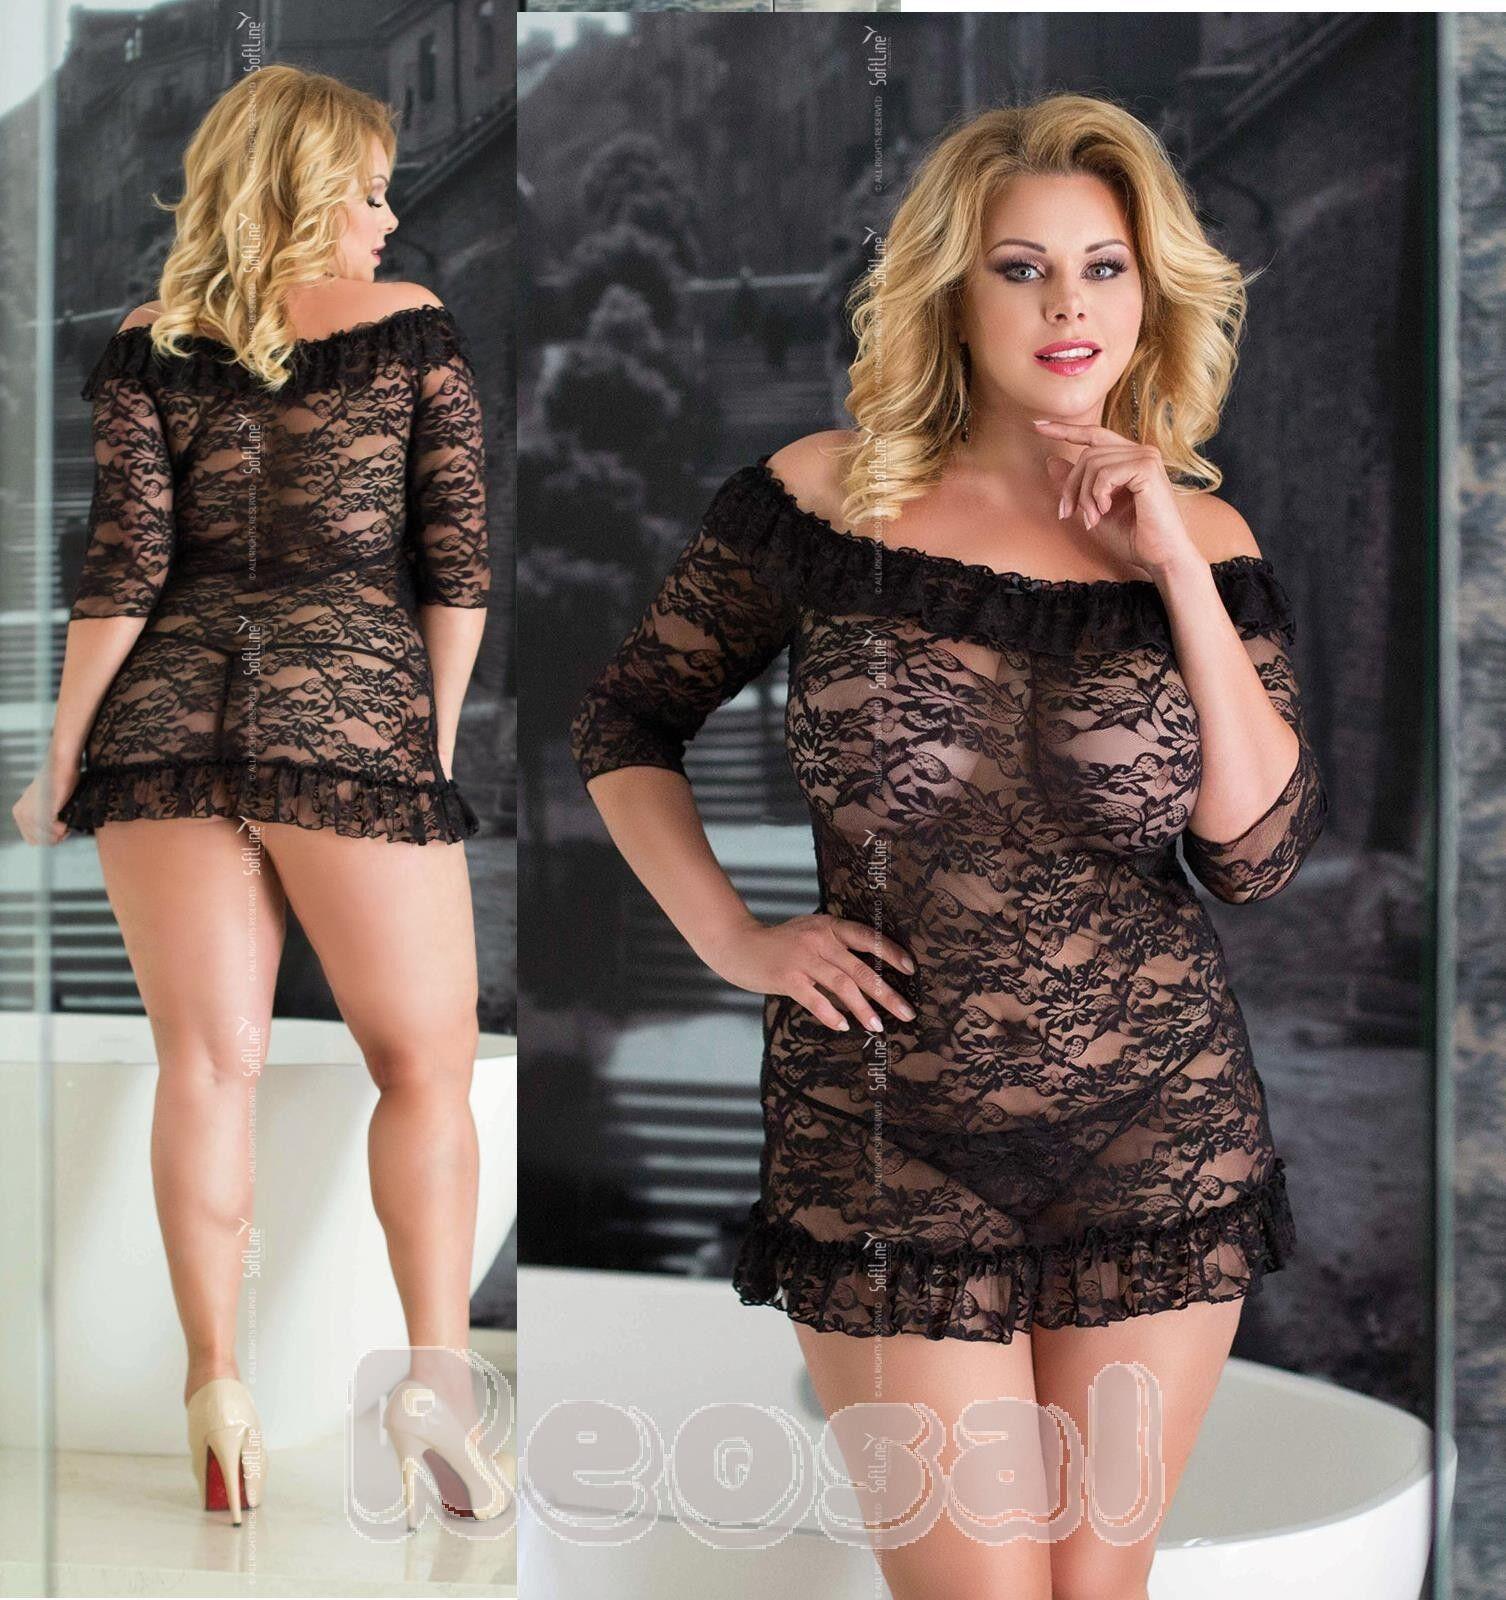 % GESCHÄFTSAUFGABE %  Plus Size  Sexy Negligee Dessous Babydoll XL-5XL 46-64